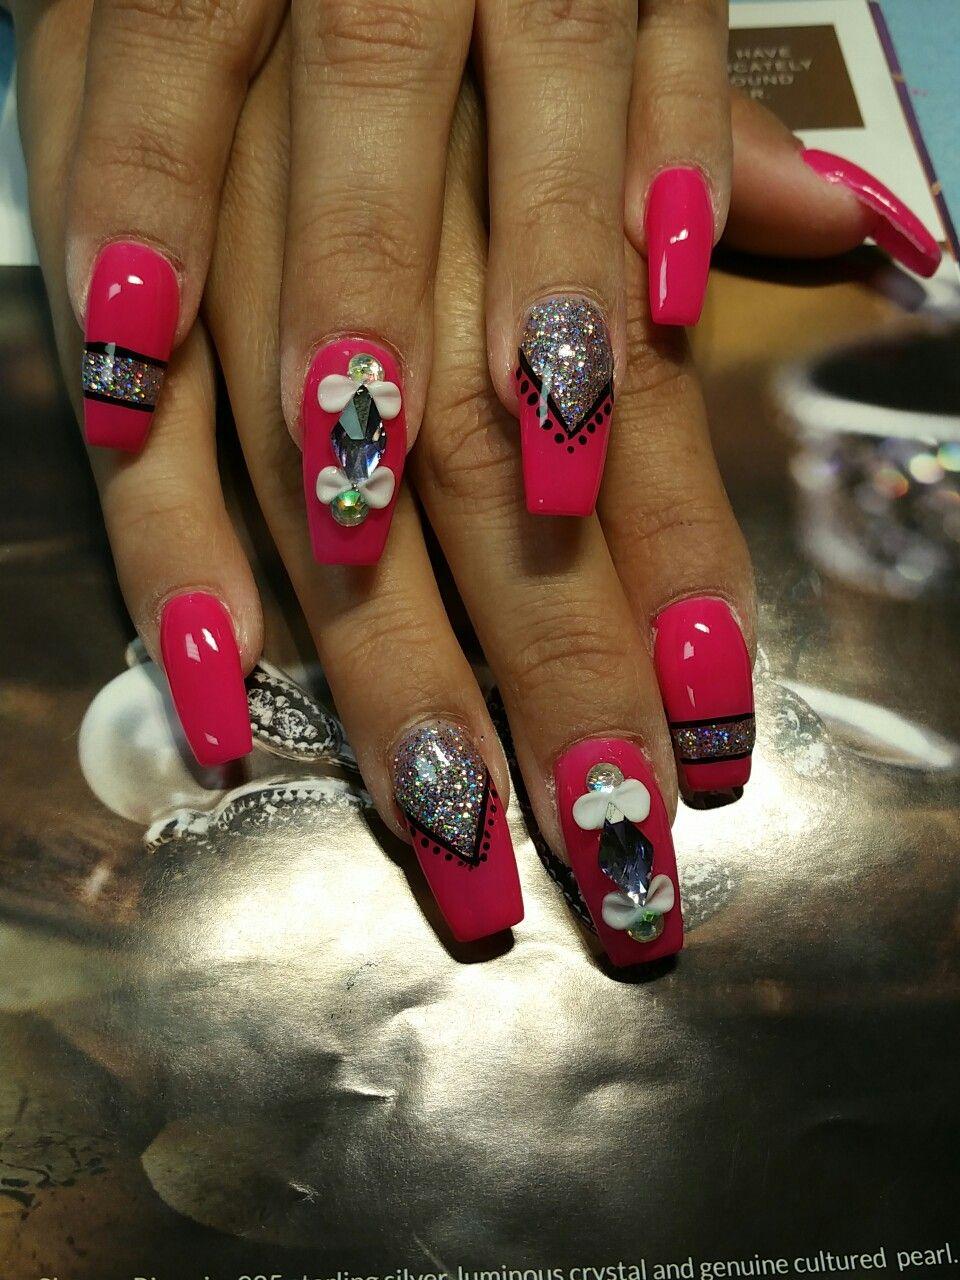 Cherryblossoms nail art by Roxy Ch - Nailpolis: Museum of